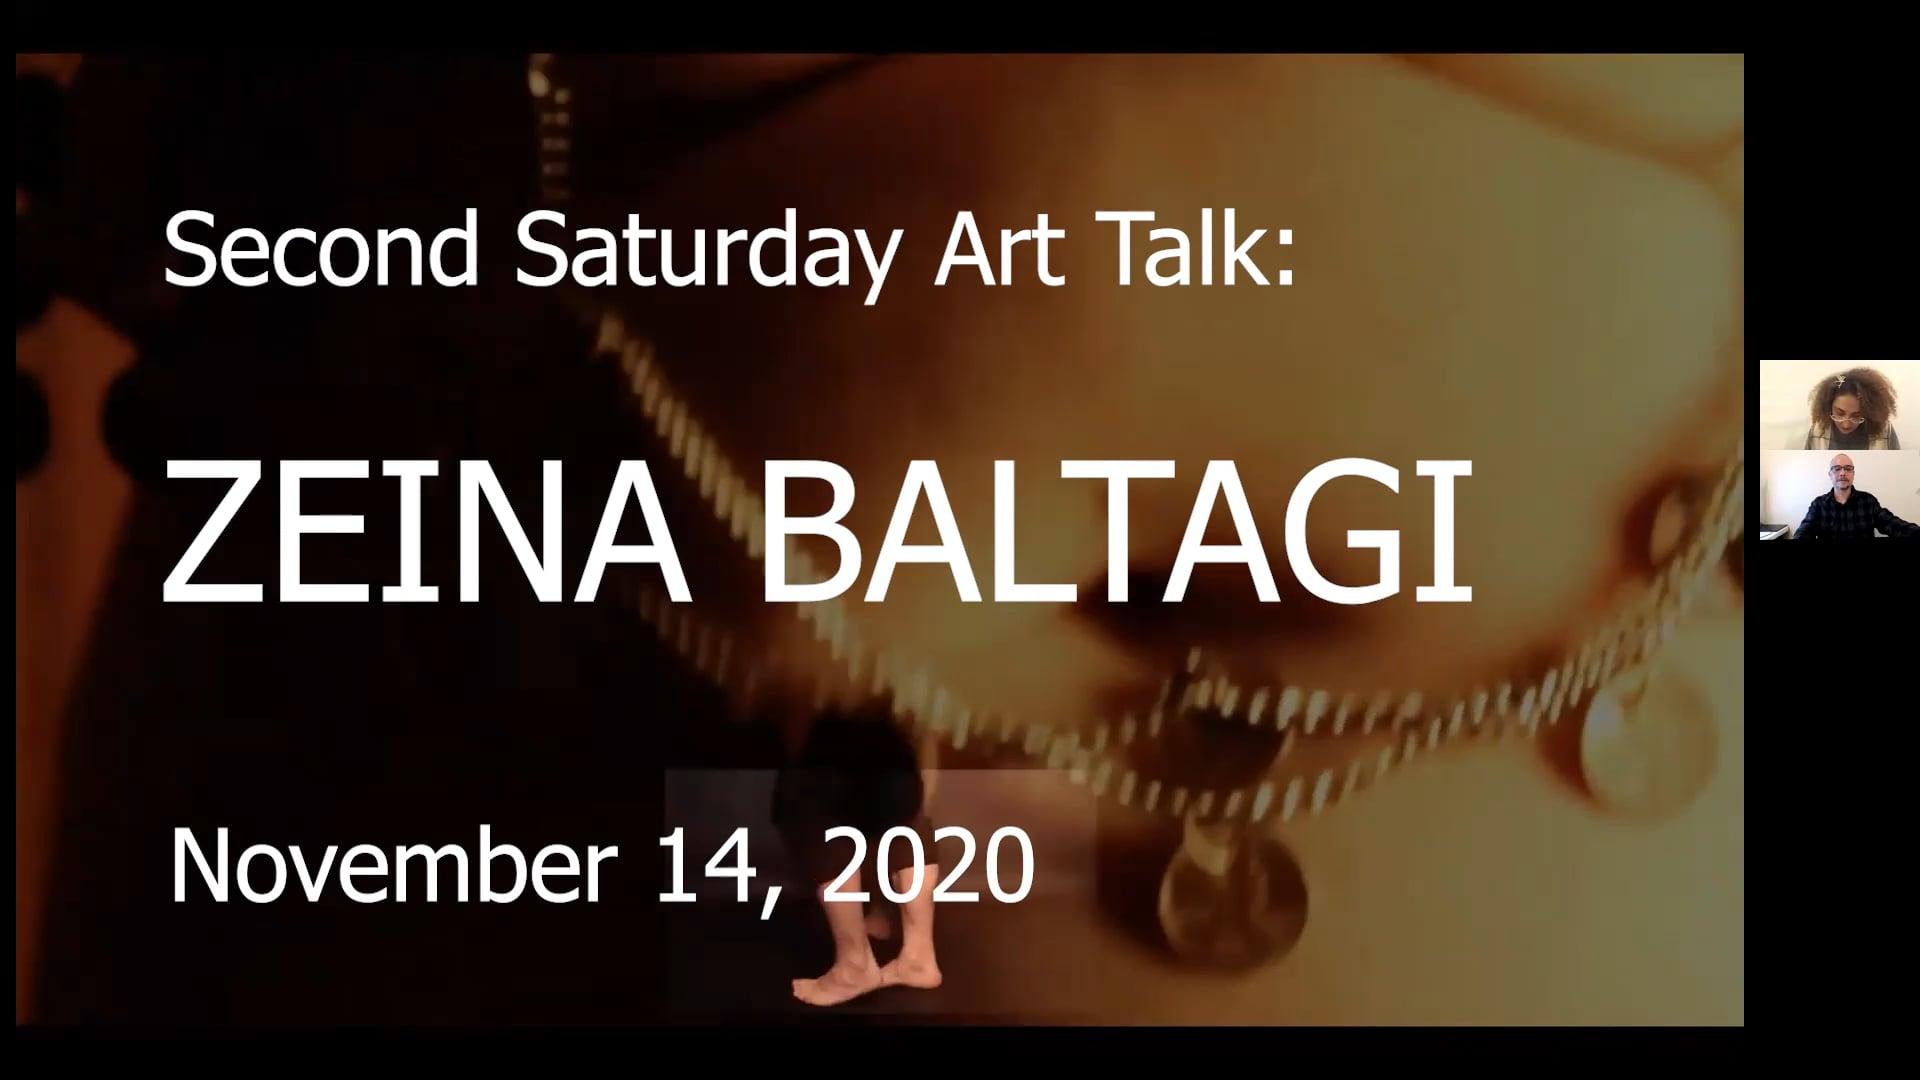 Zeina Baltagi at CACAC Gallery, Nov-14-20